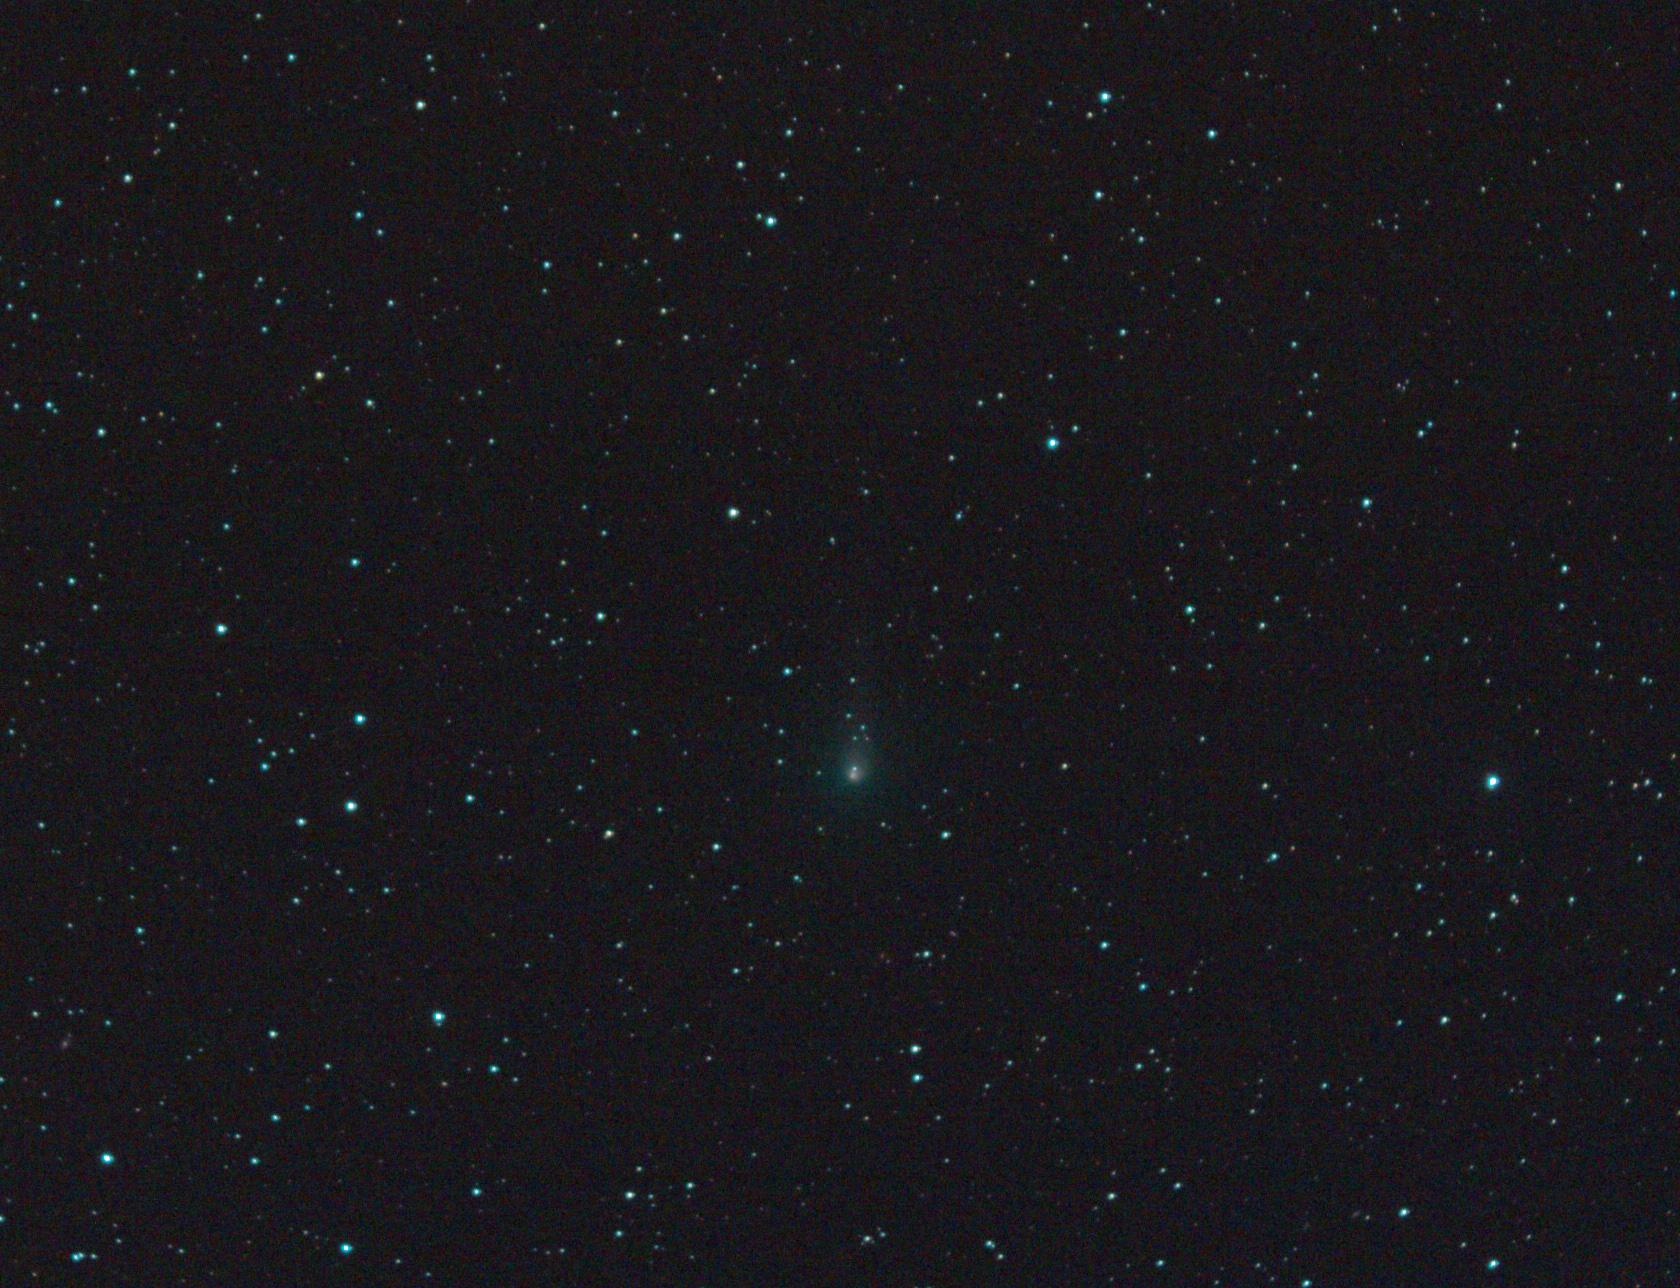 kometa C/2014 X1 (PanSTARRS) 30. 12. 2015